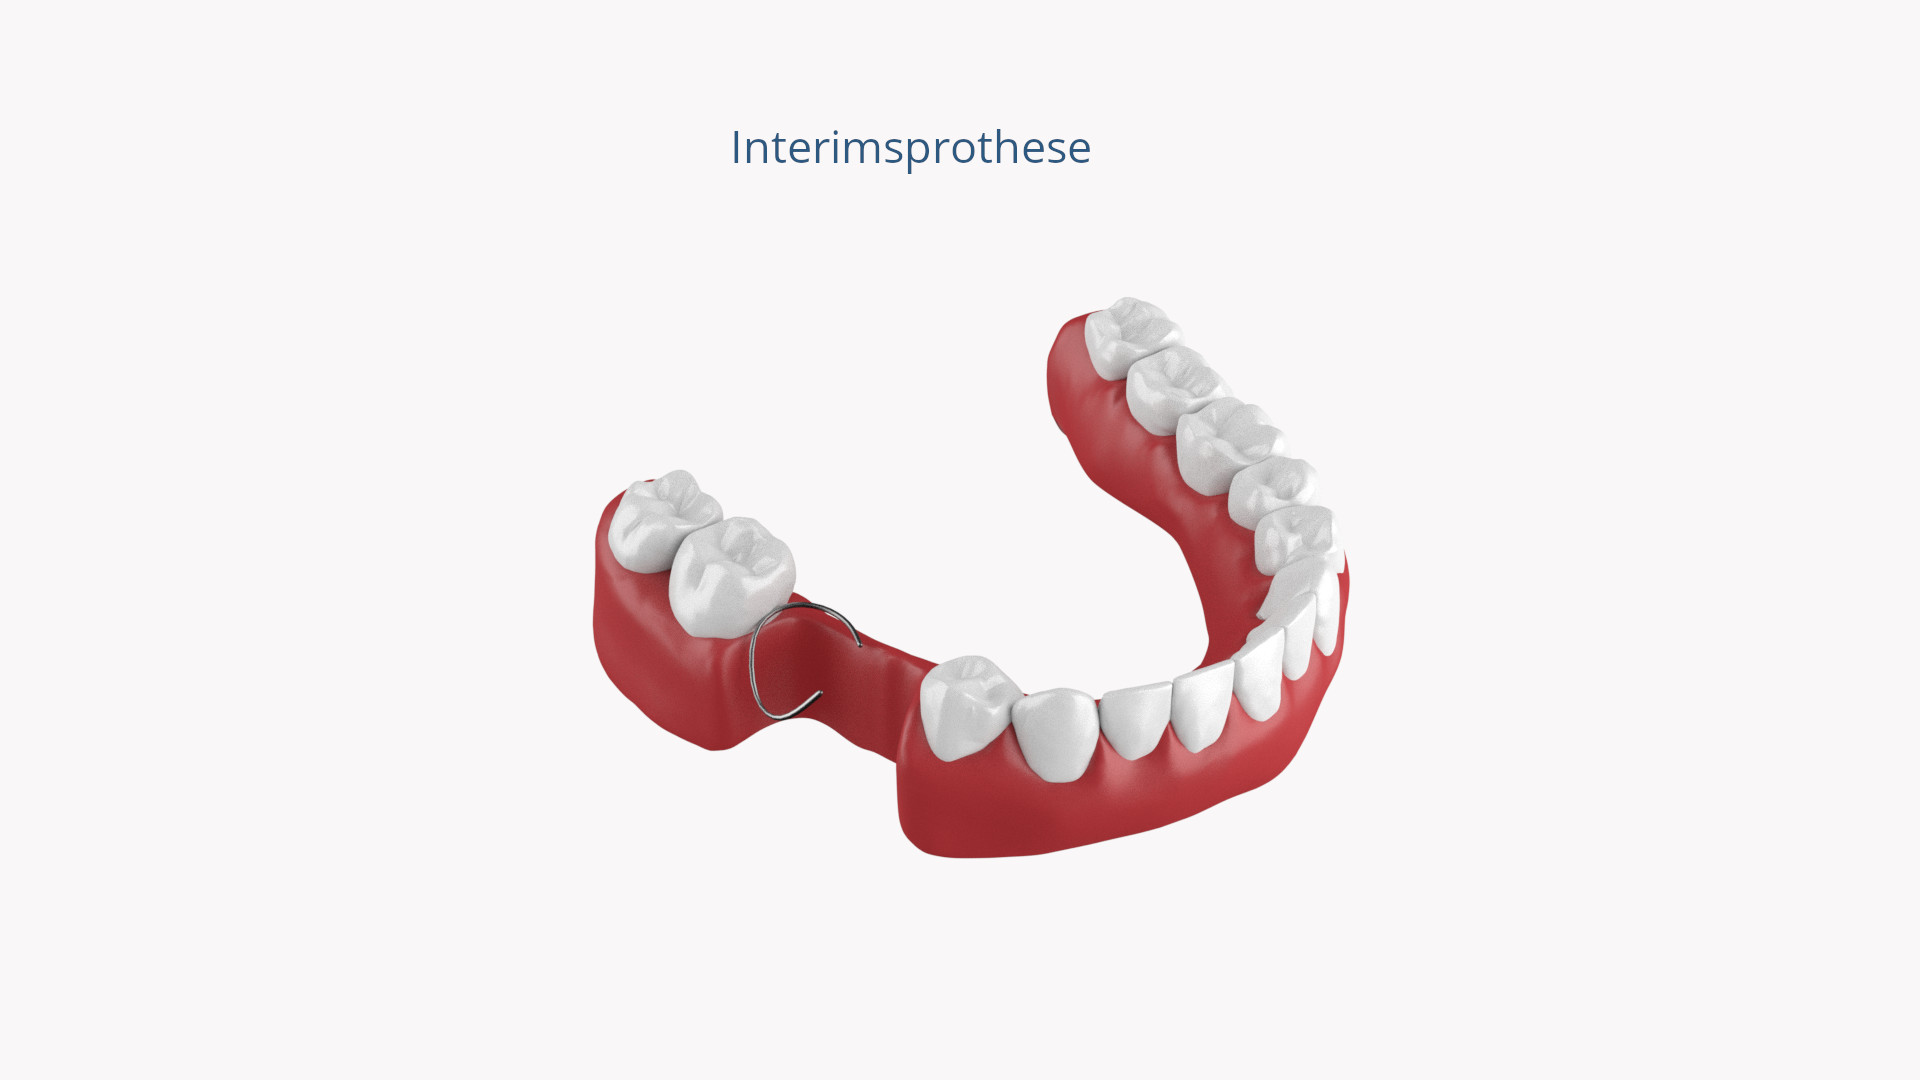 Interimsprothese